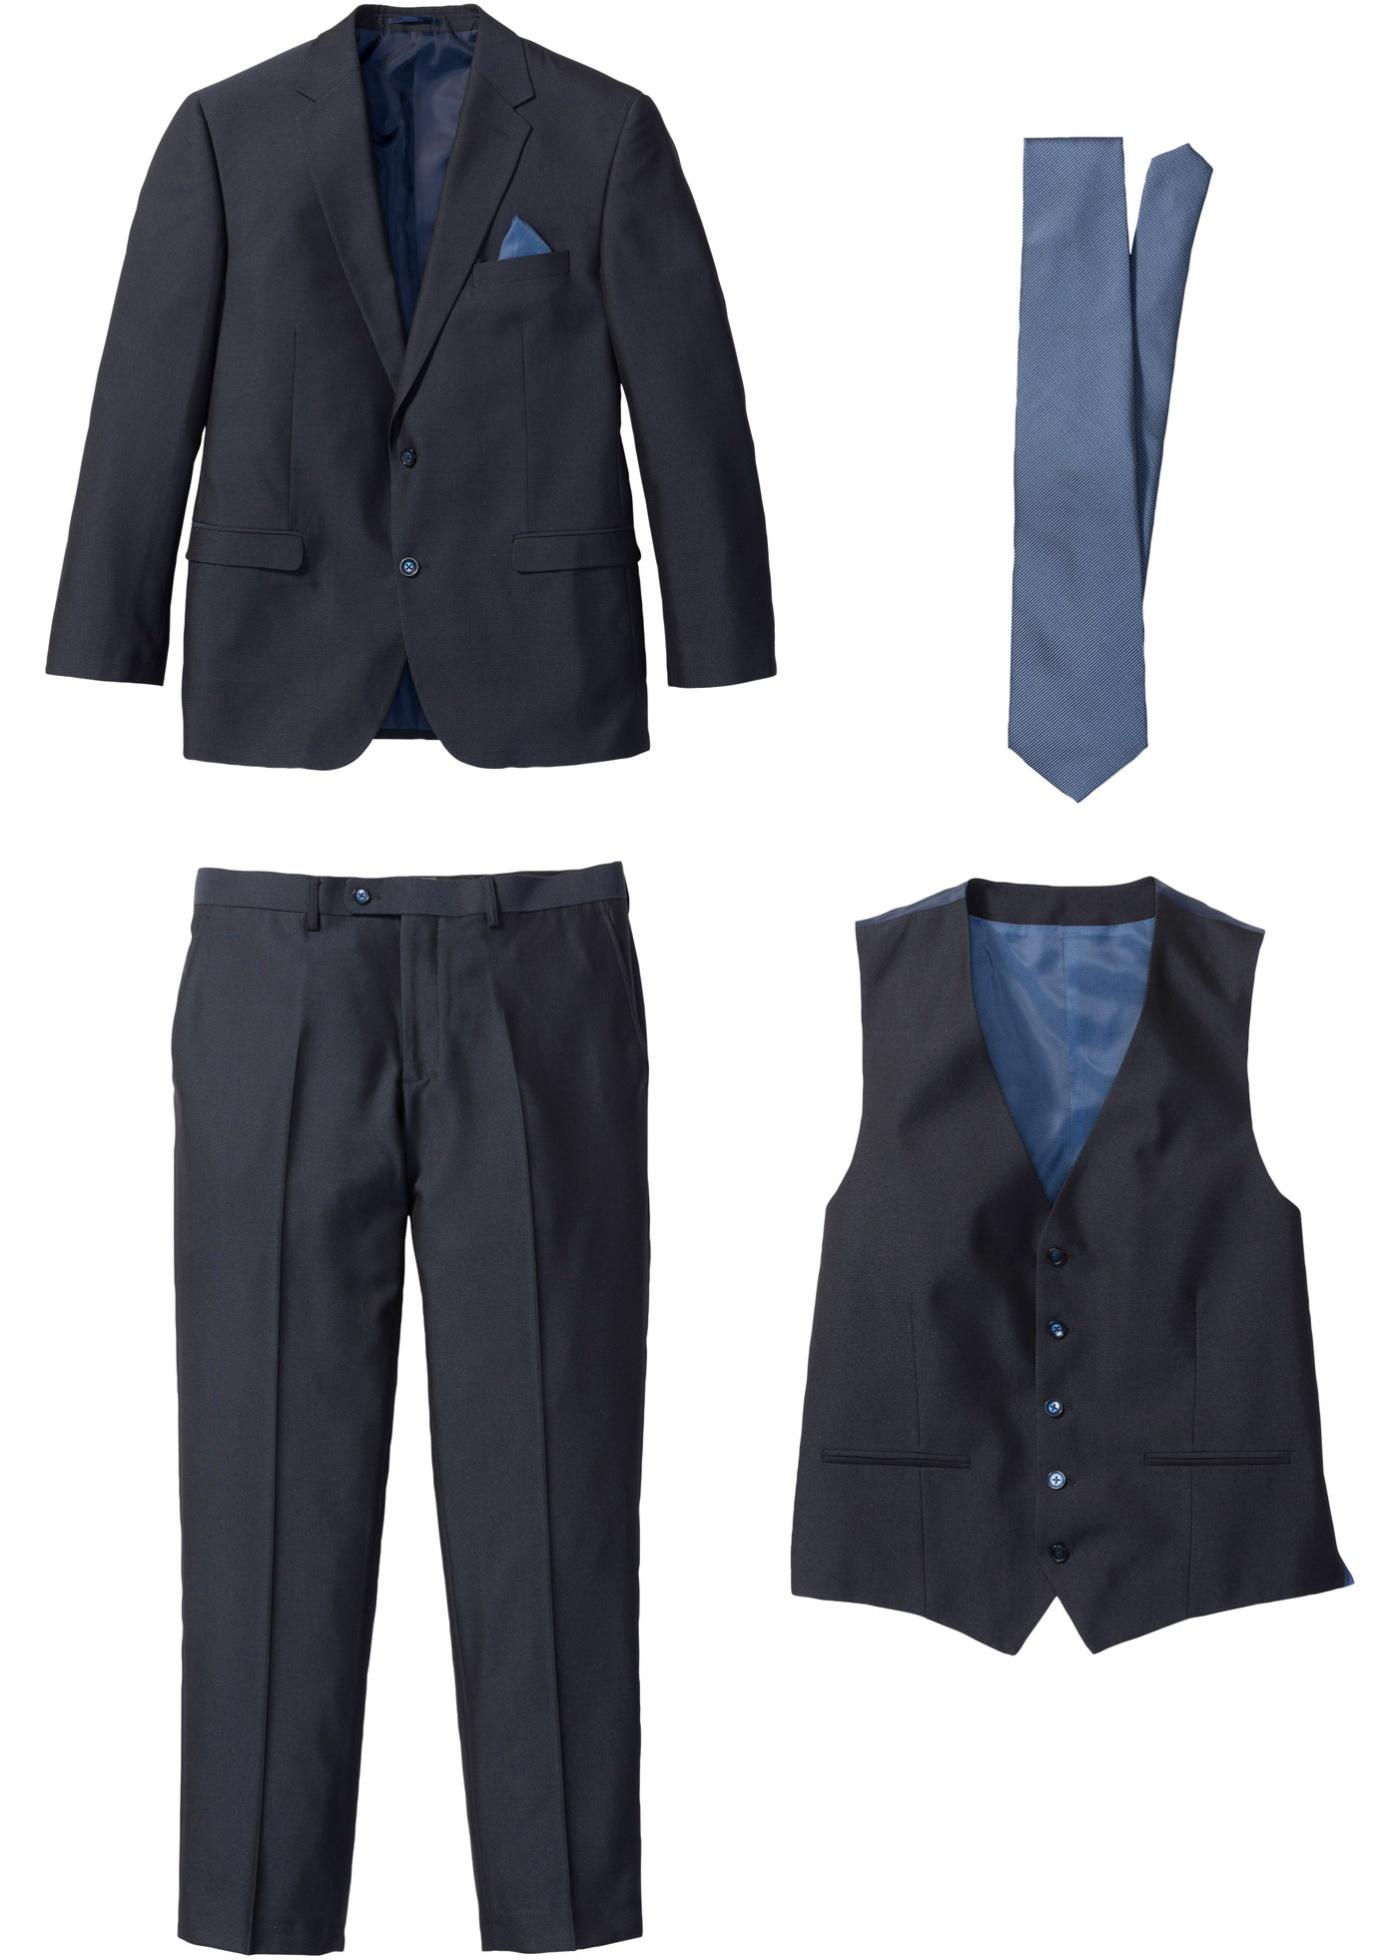 Image of Anzug (4-tlg. Set): Sakko, Hose, Weste, Krawatte